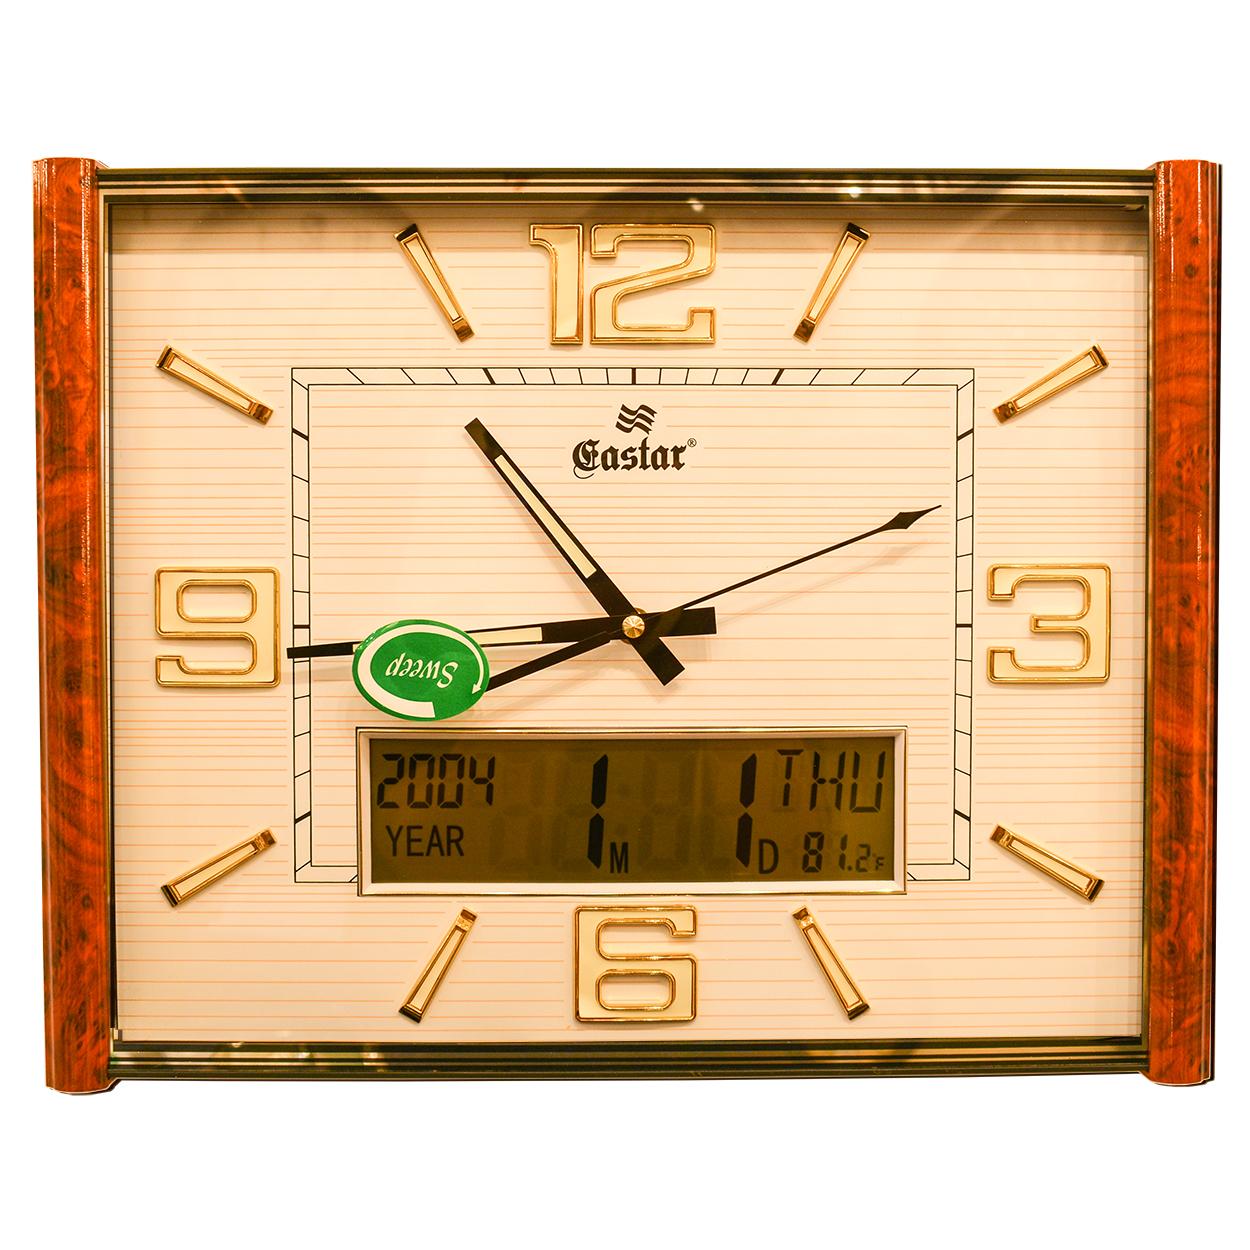 ساعت دیواری استار مدل T581A